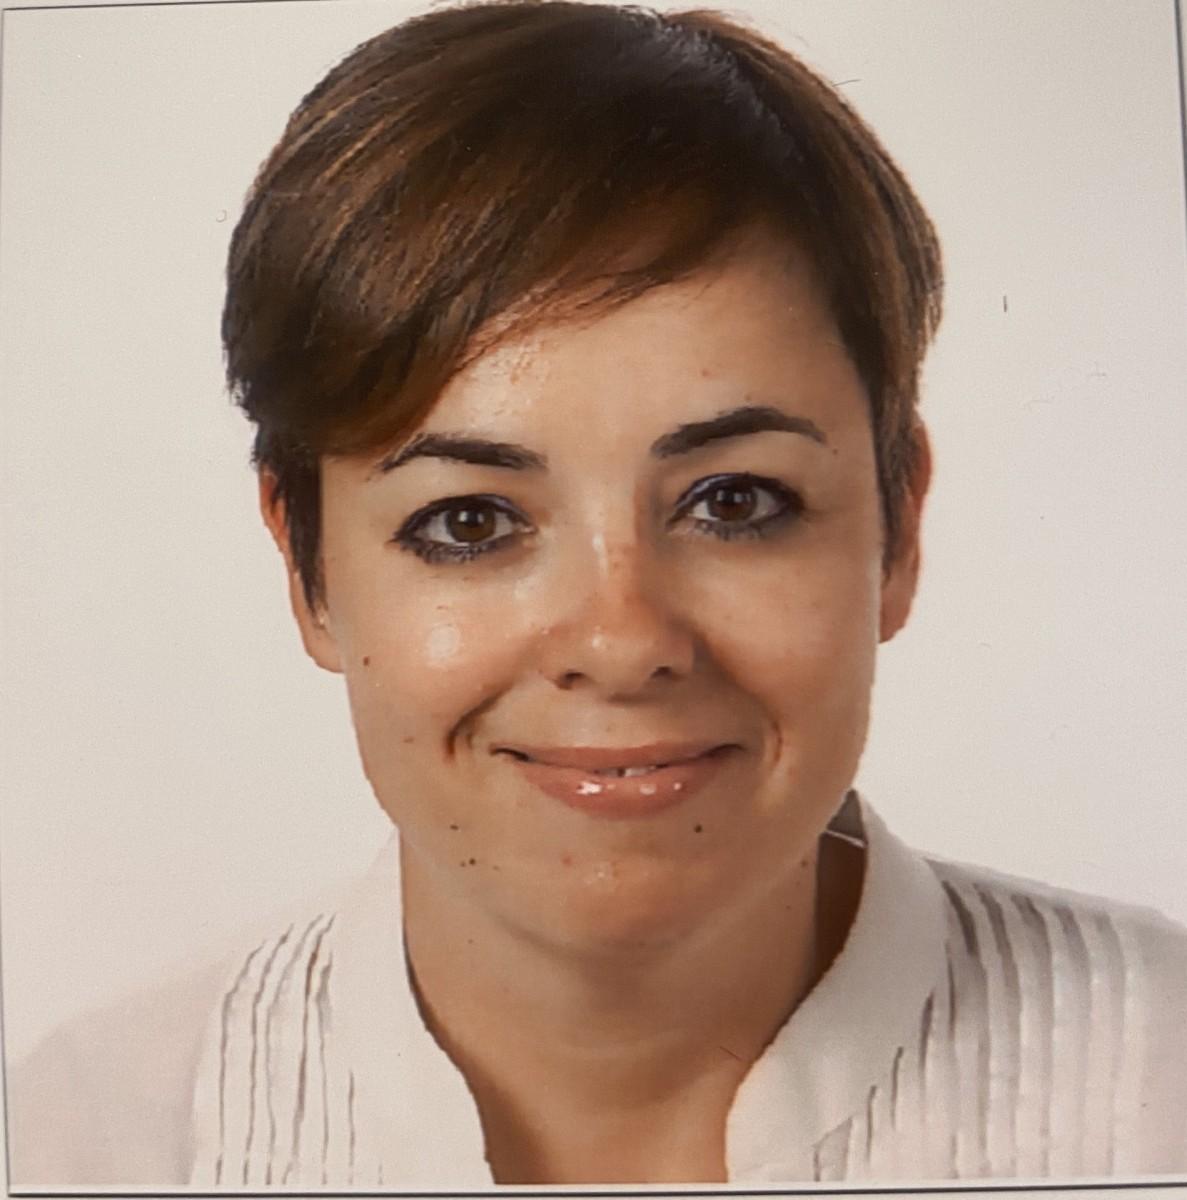 Dott.ssa BALLETTI ERIKA - Collaboratrice Dermatologa